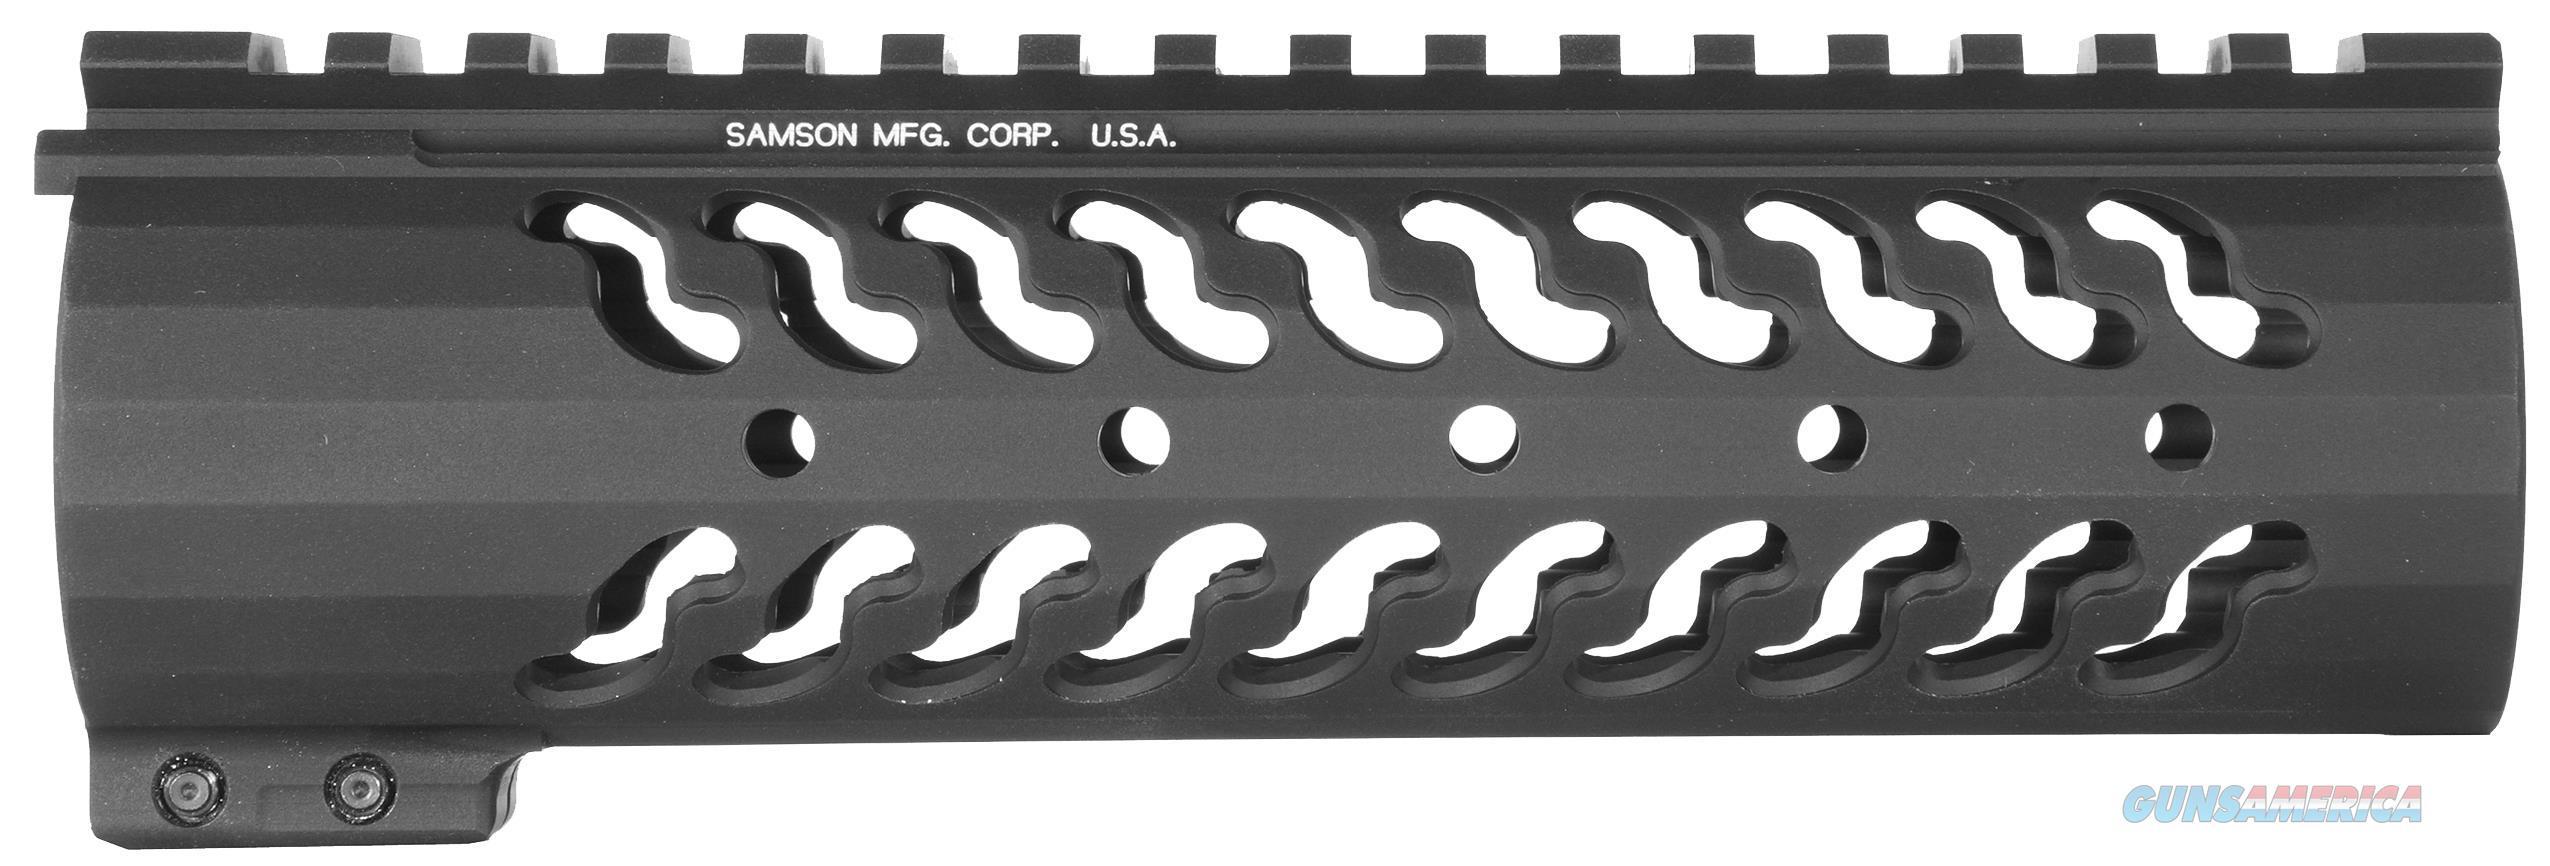 "Samson Evo-9 Evolution 9"" Handguard W/Rails Ar-15 Alum Black EVO-9  Non-Guns > Gunstocks, Grips & Wood"